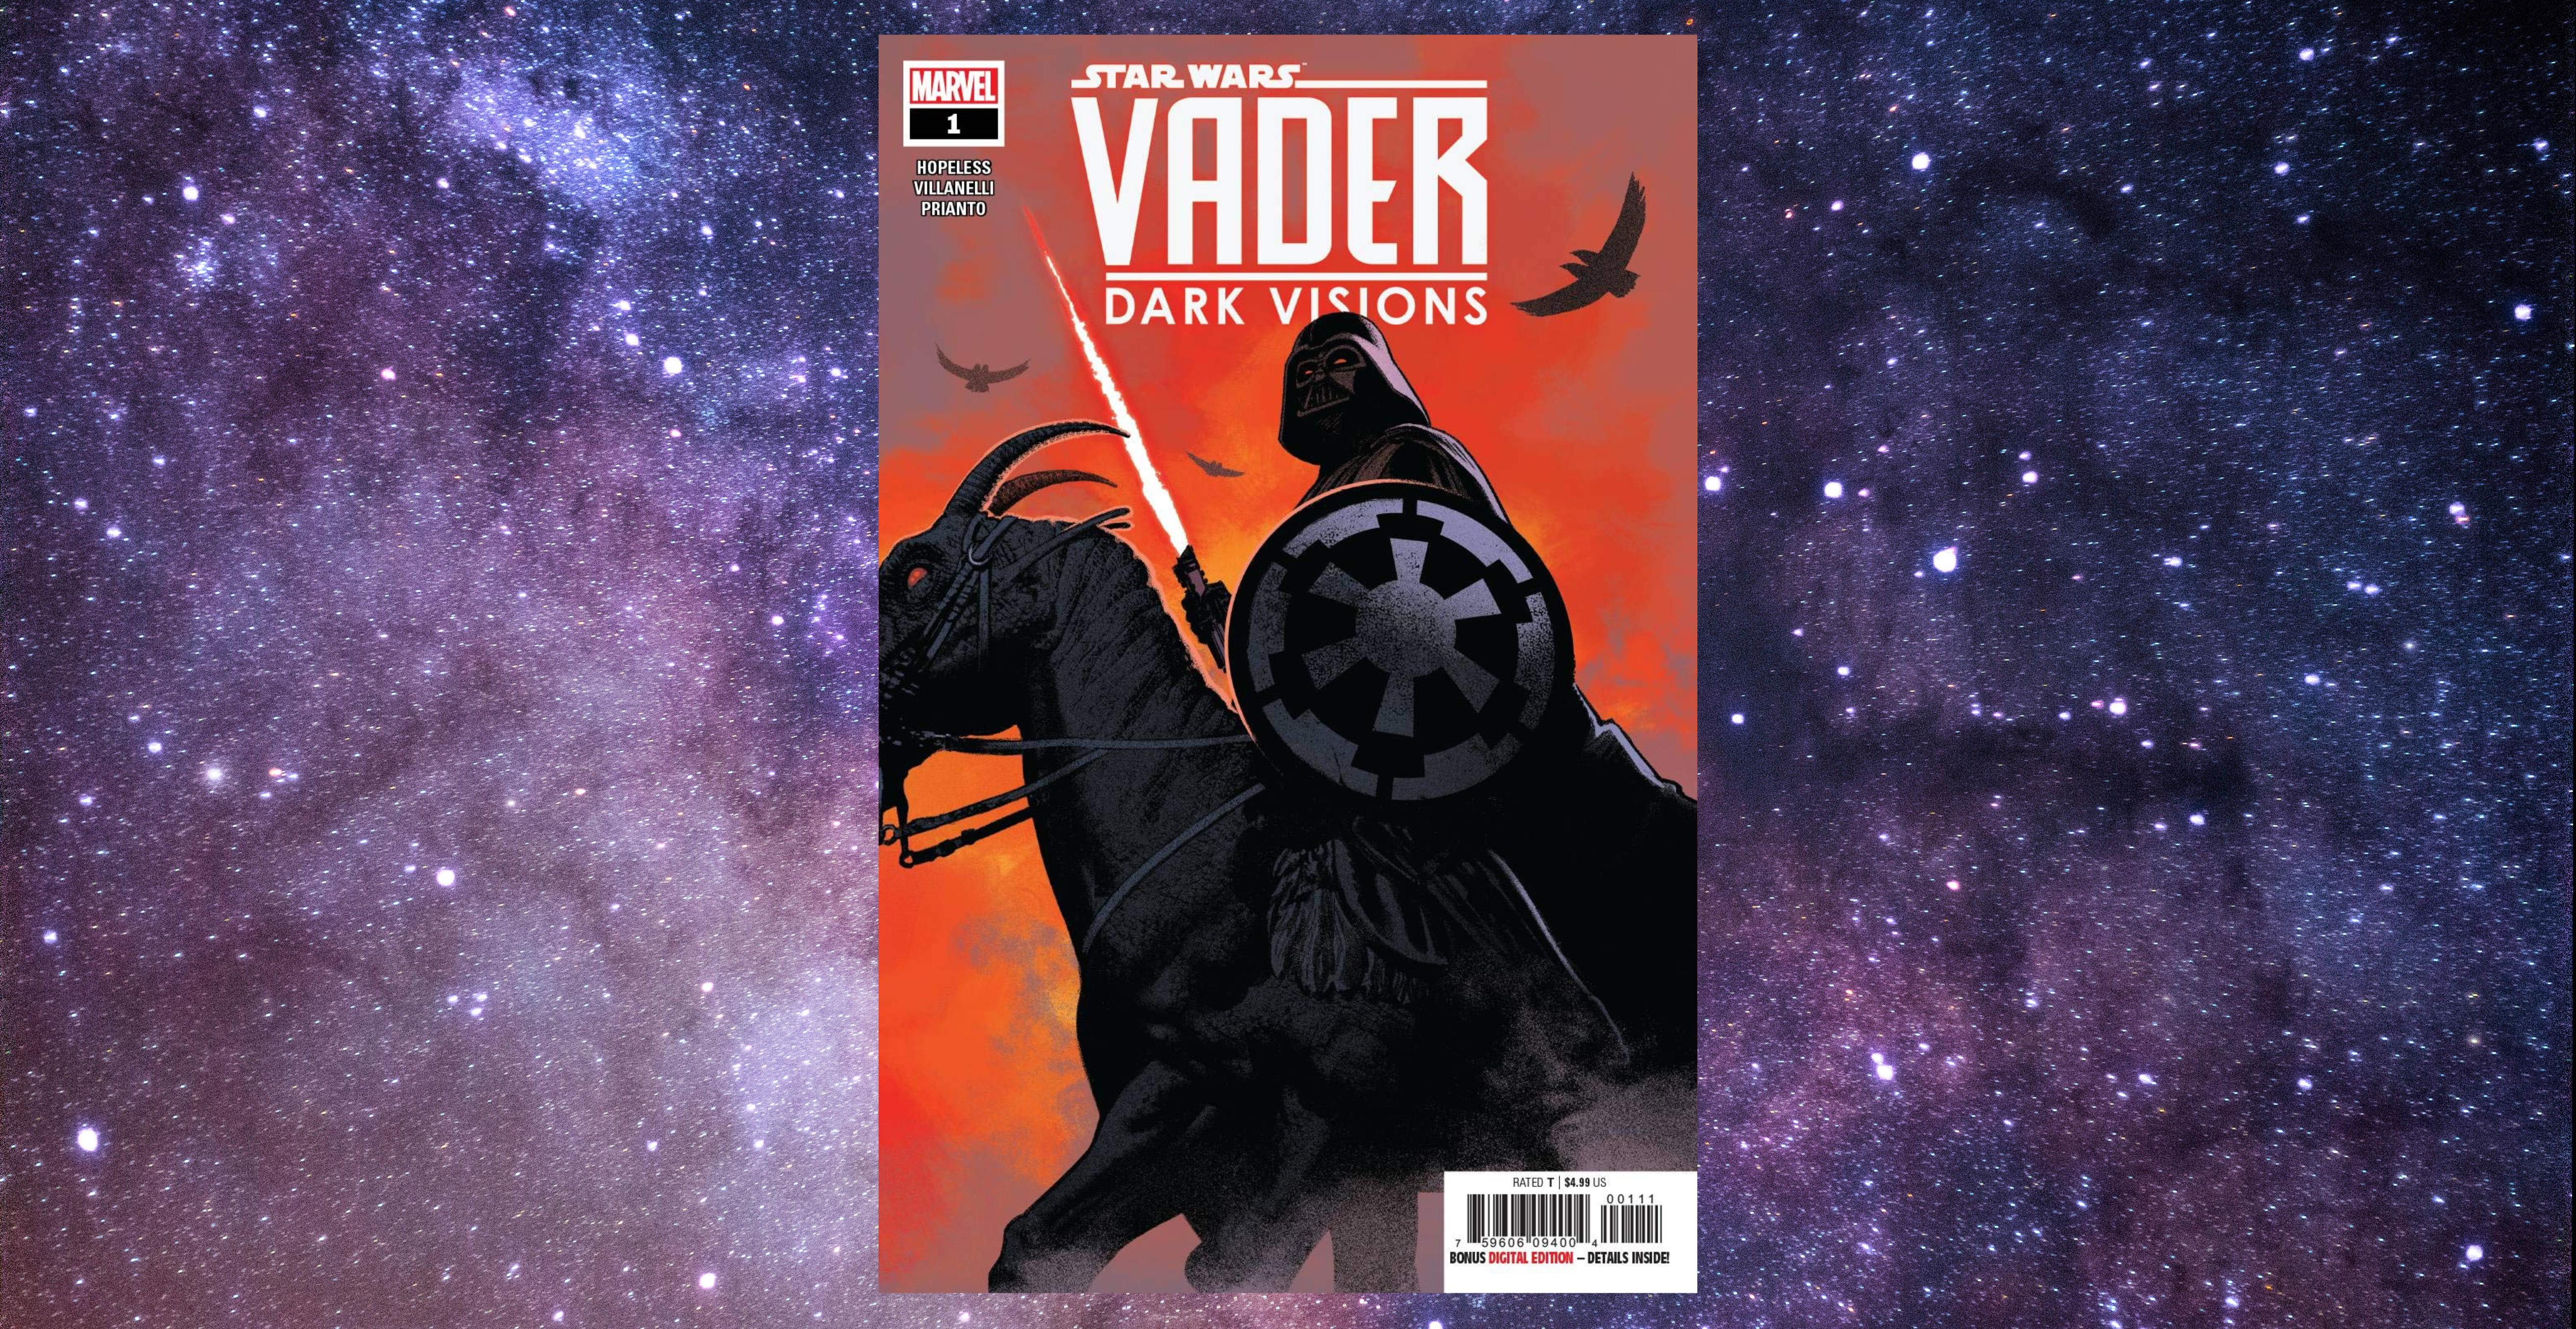 Star Wars Darth Vader Dark Visions Rise of Skywalker